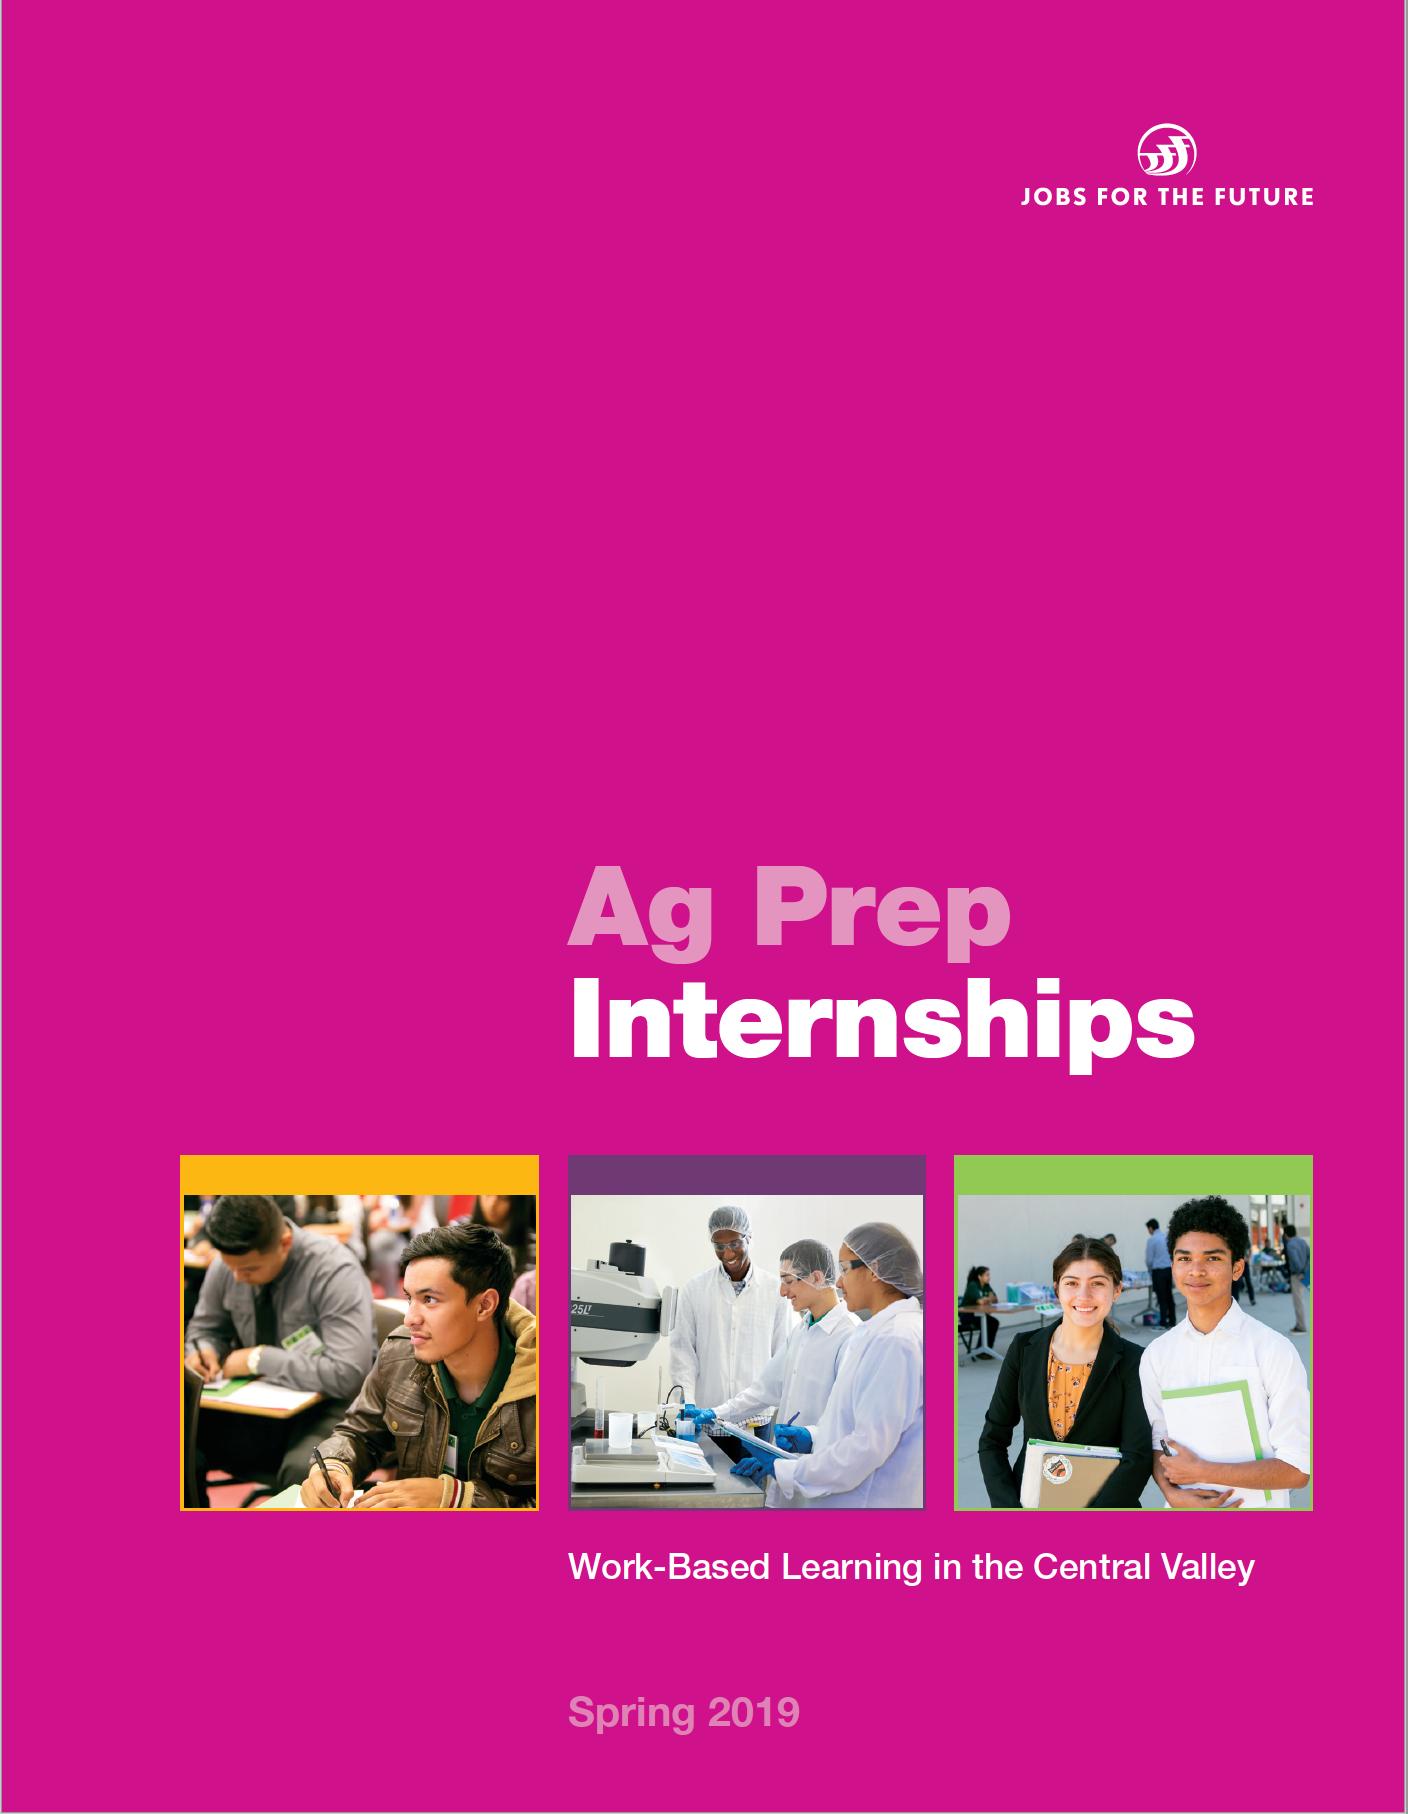 Ag Prep Internships